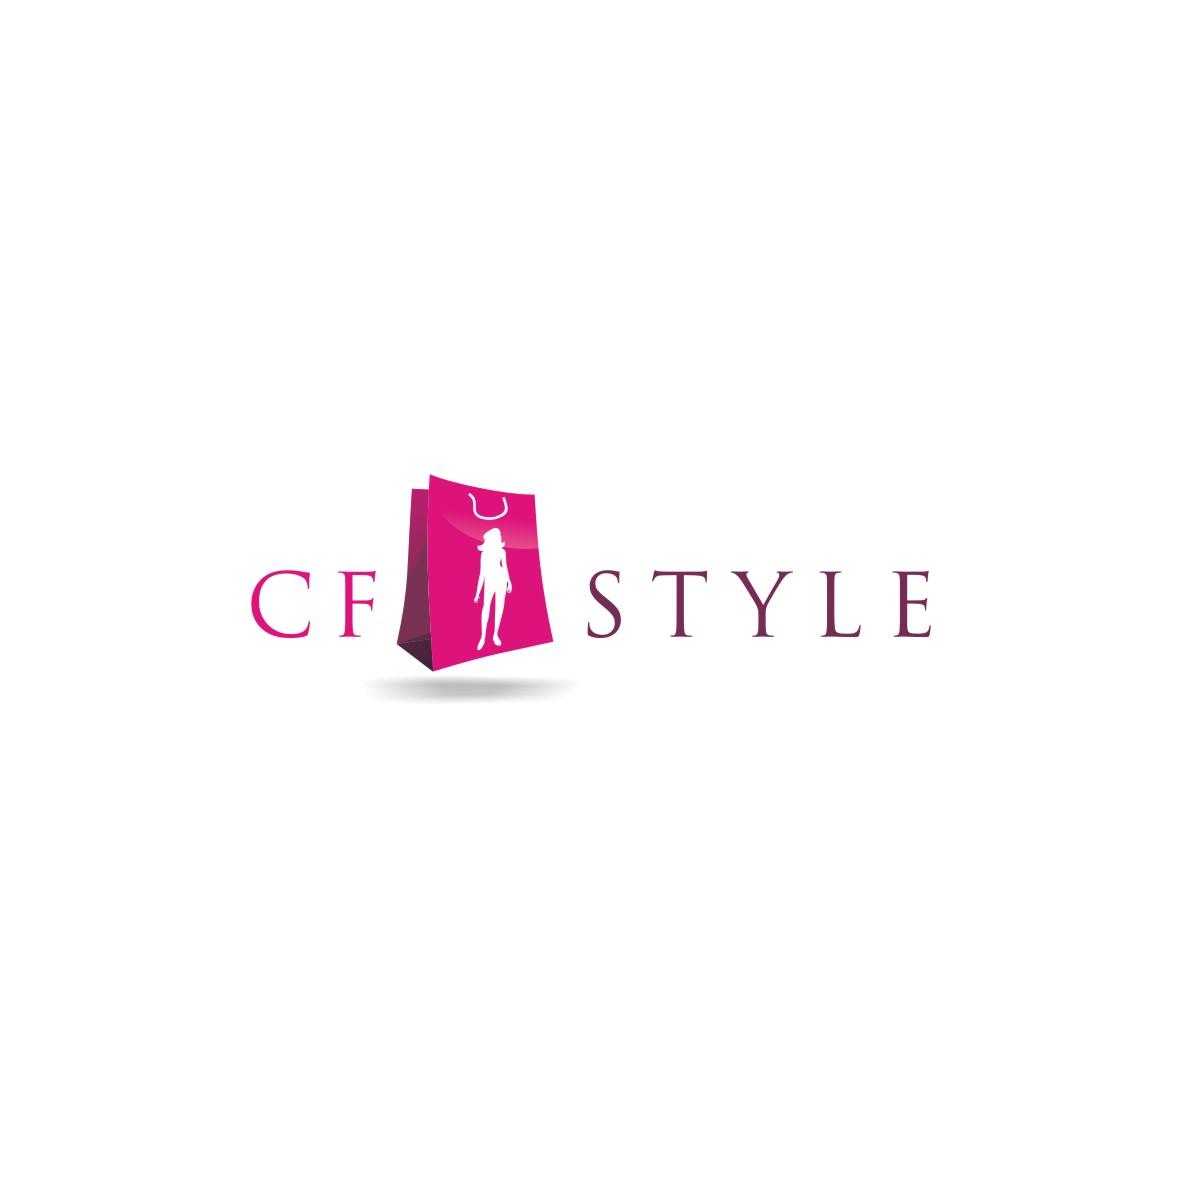 Exklusiv Elegant Clothing Logo Design For Cf Style By